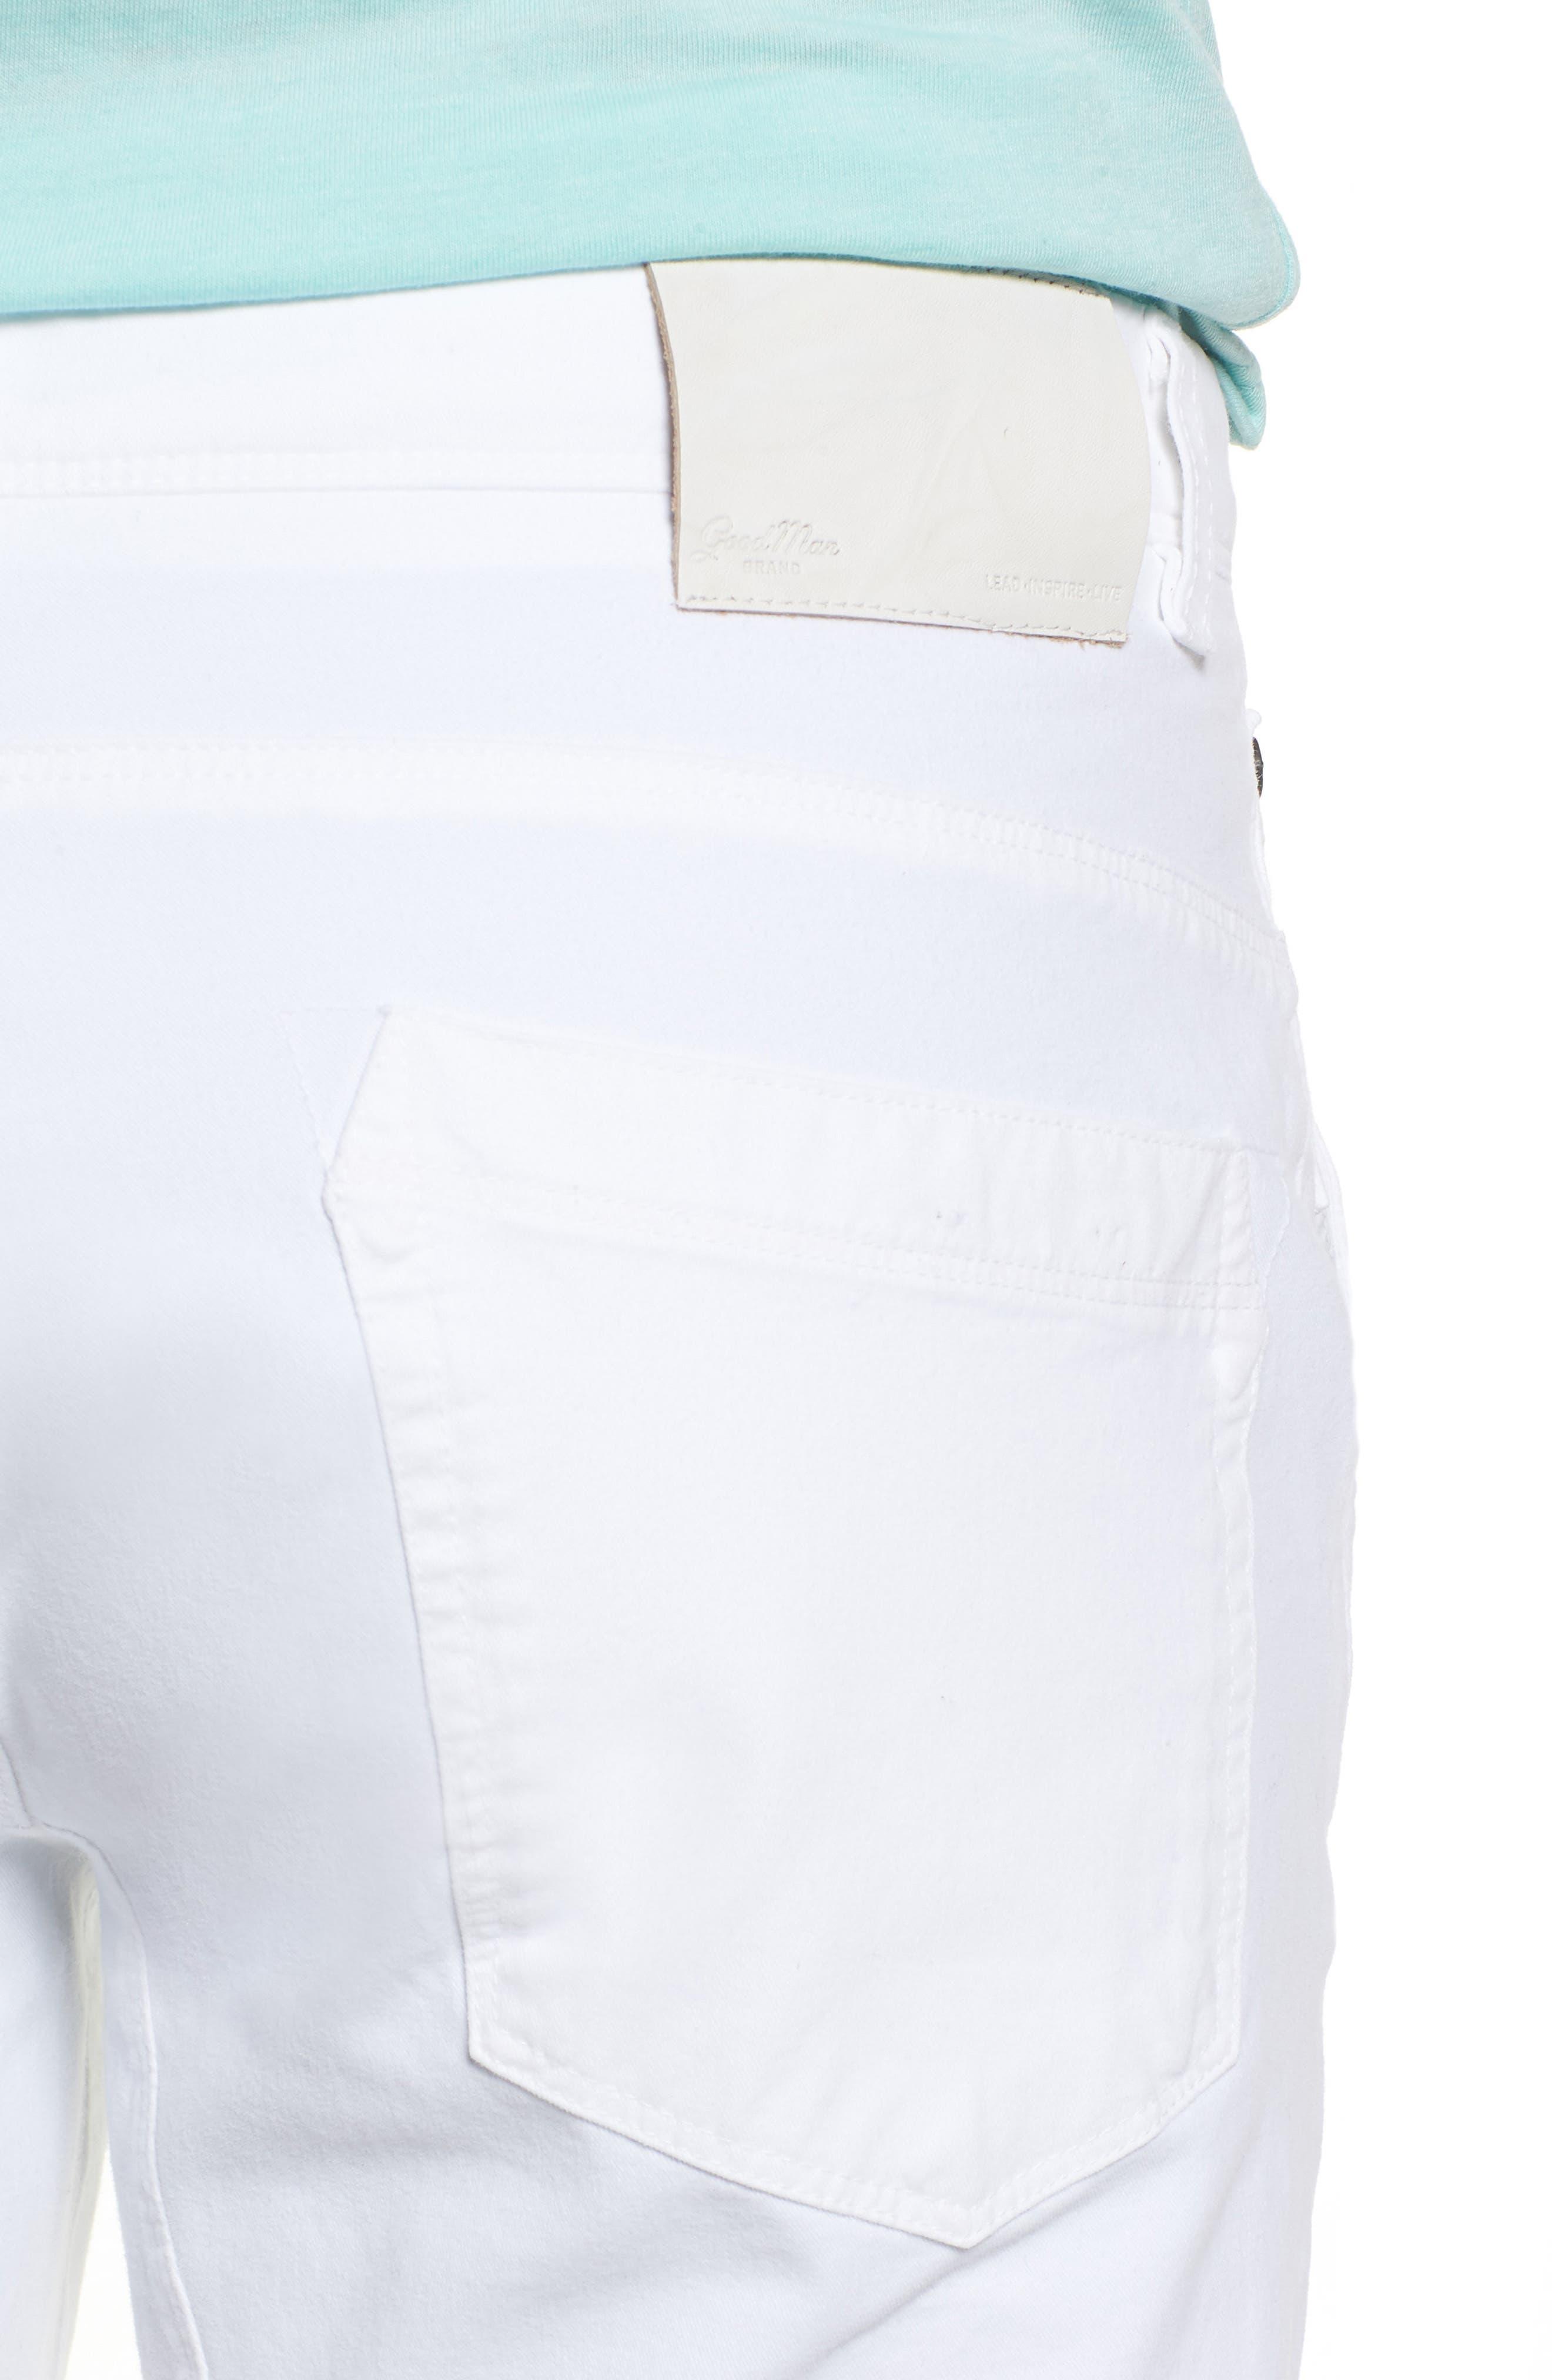 Hybrid Slim Fit Stretch Pants,                             Alternate thumbnail 4, color,                             100